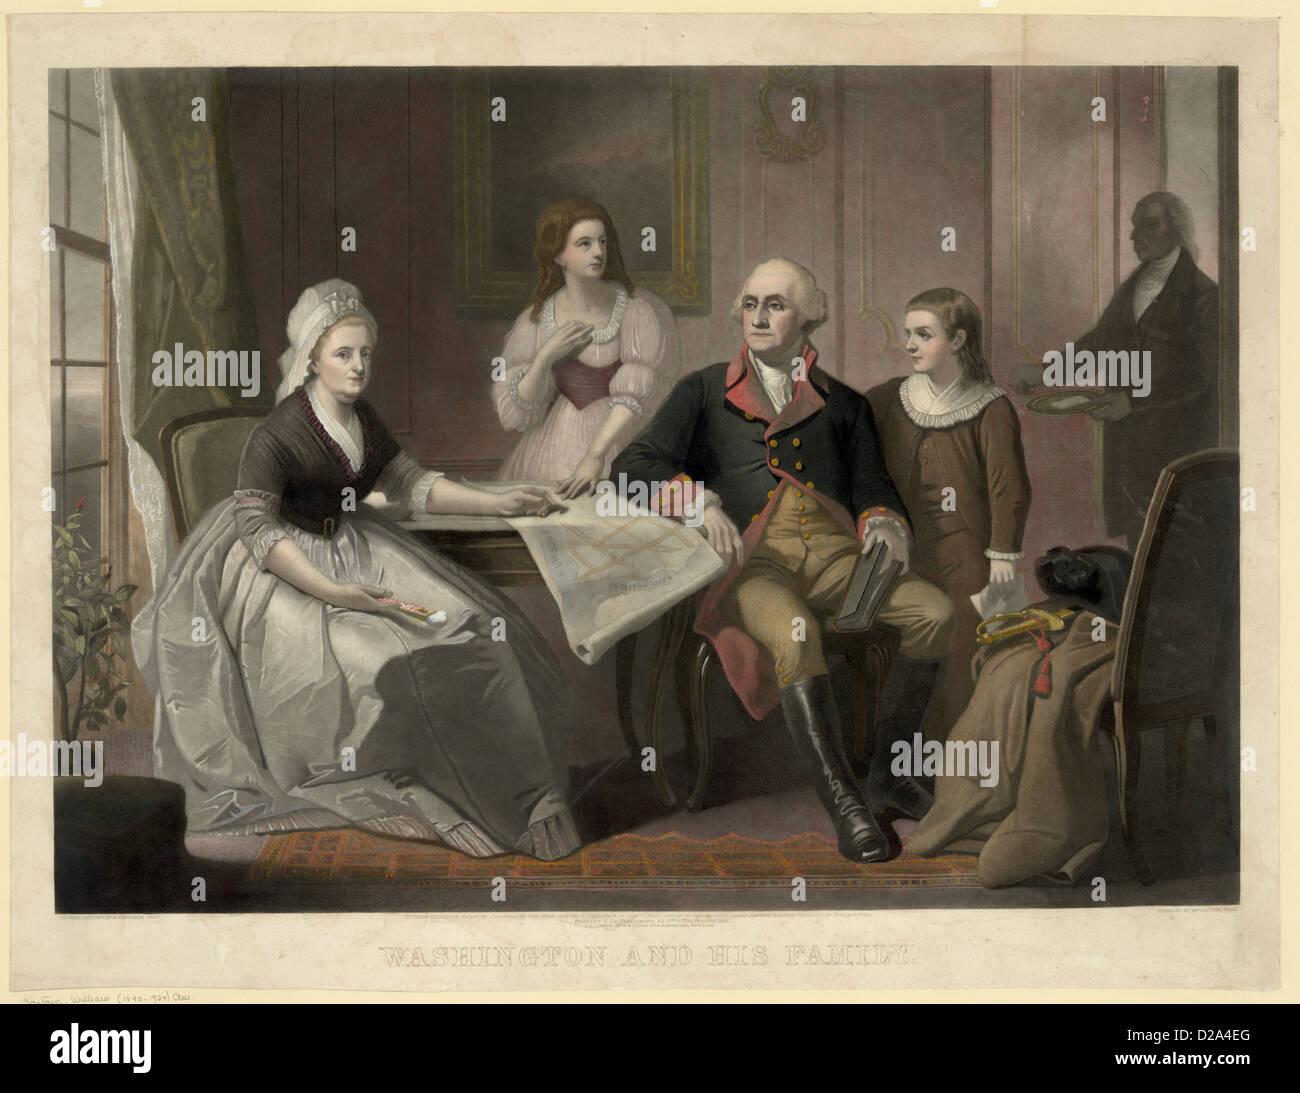 Washington And His Family / Original Painting By C. Schussele, Phila. ; Engraved By Wm. Sartain, Phila. C1864 - Stock Image